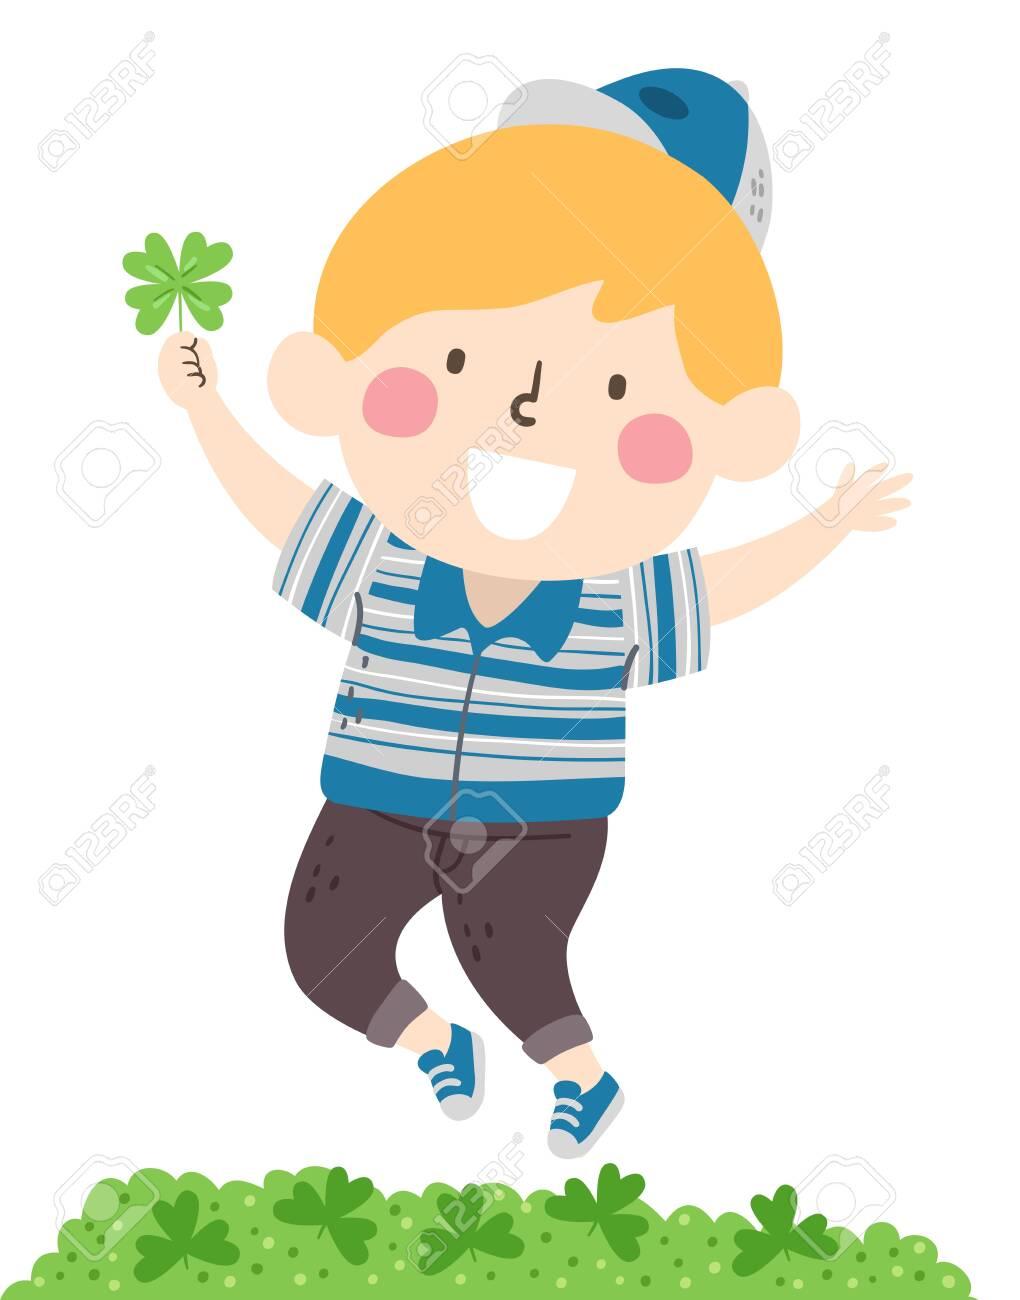 Illustration Of A Kid Boy Jumping After Finding A Four Leaf Clover Lizenzfreie Fotos Bilder Und Stock Fotografie Image 131653894